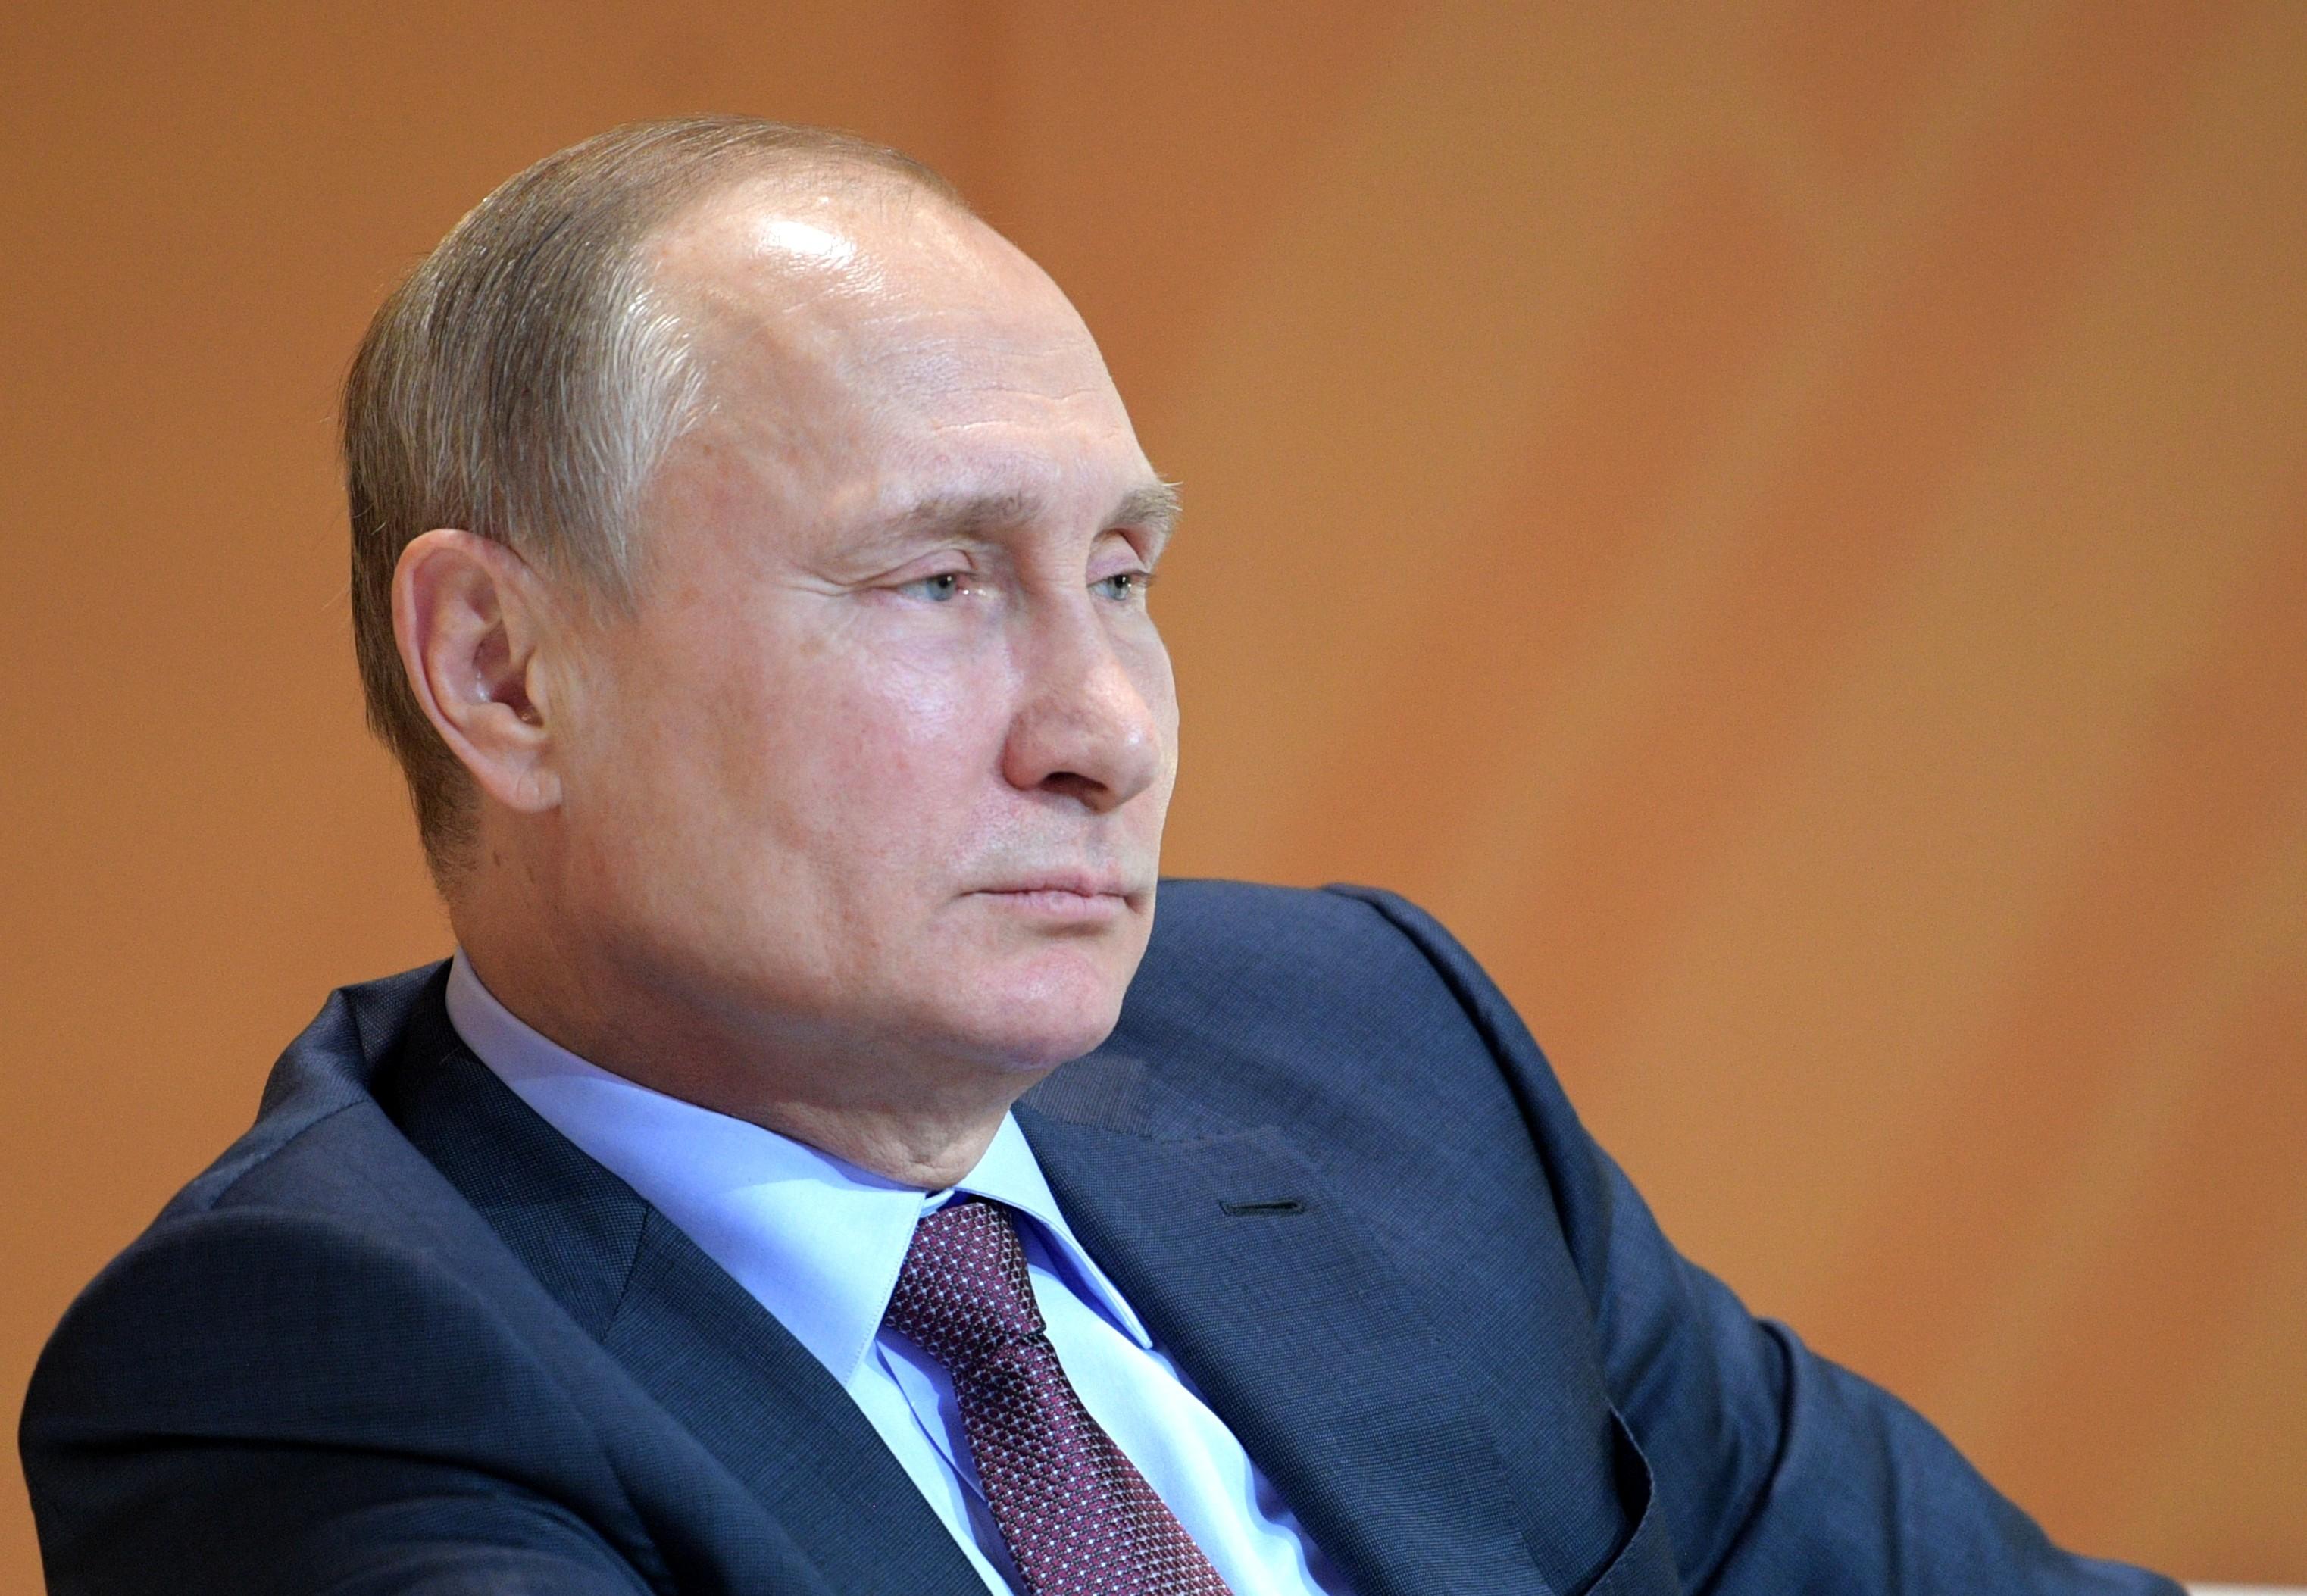 <p><span>Президент РФ Владимир Путин.&nbsp;Фото &copy; РИА Новости/Алексей Дружинин</span></p>